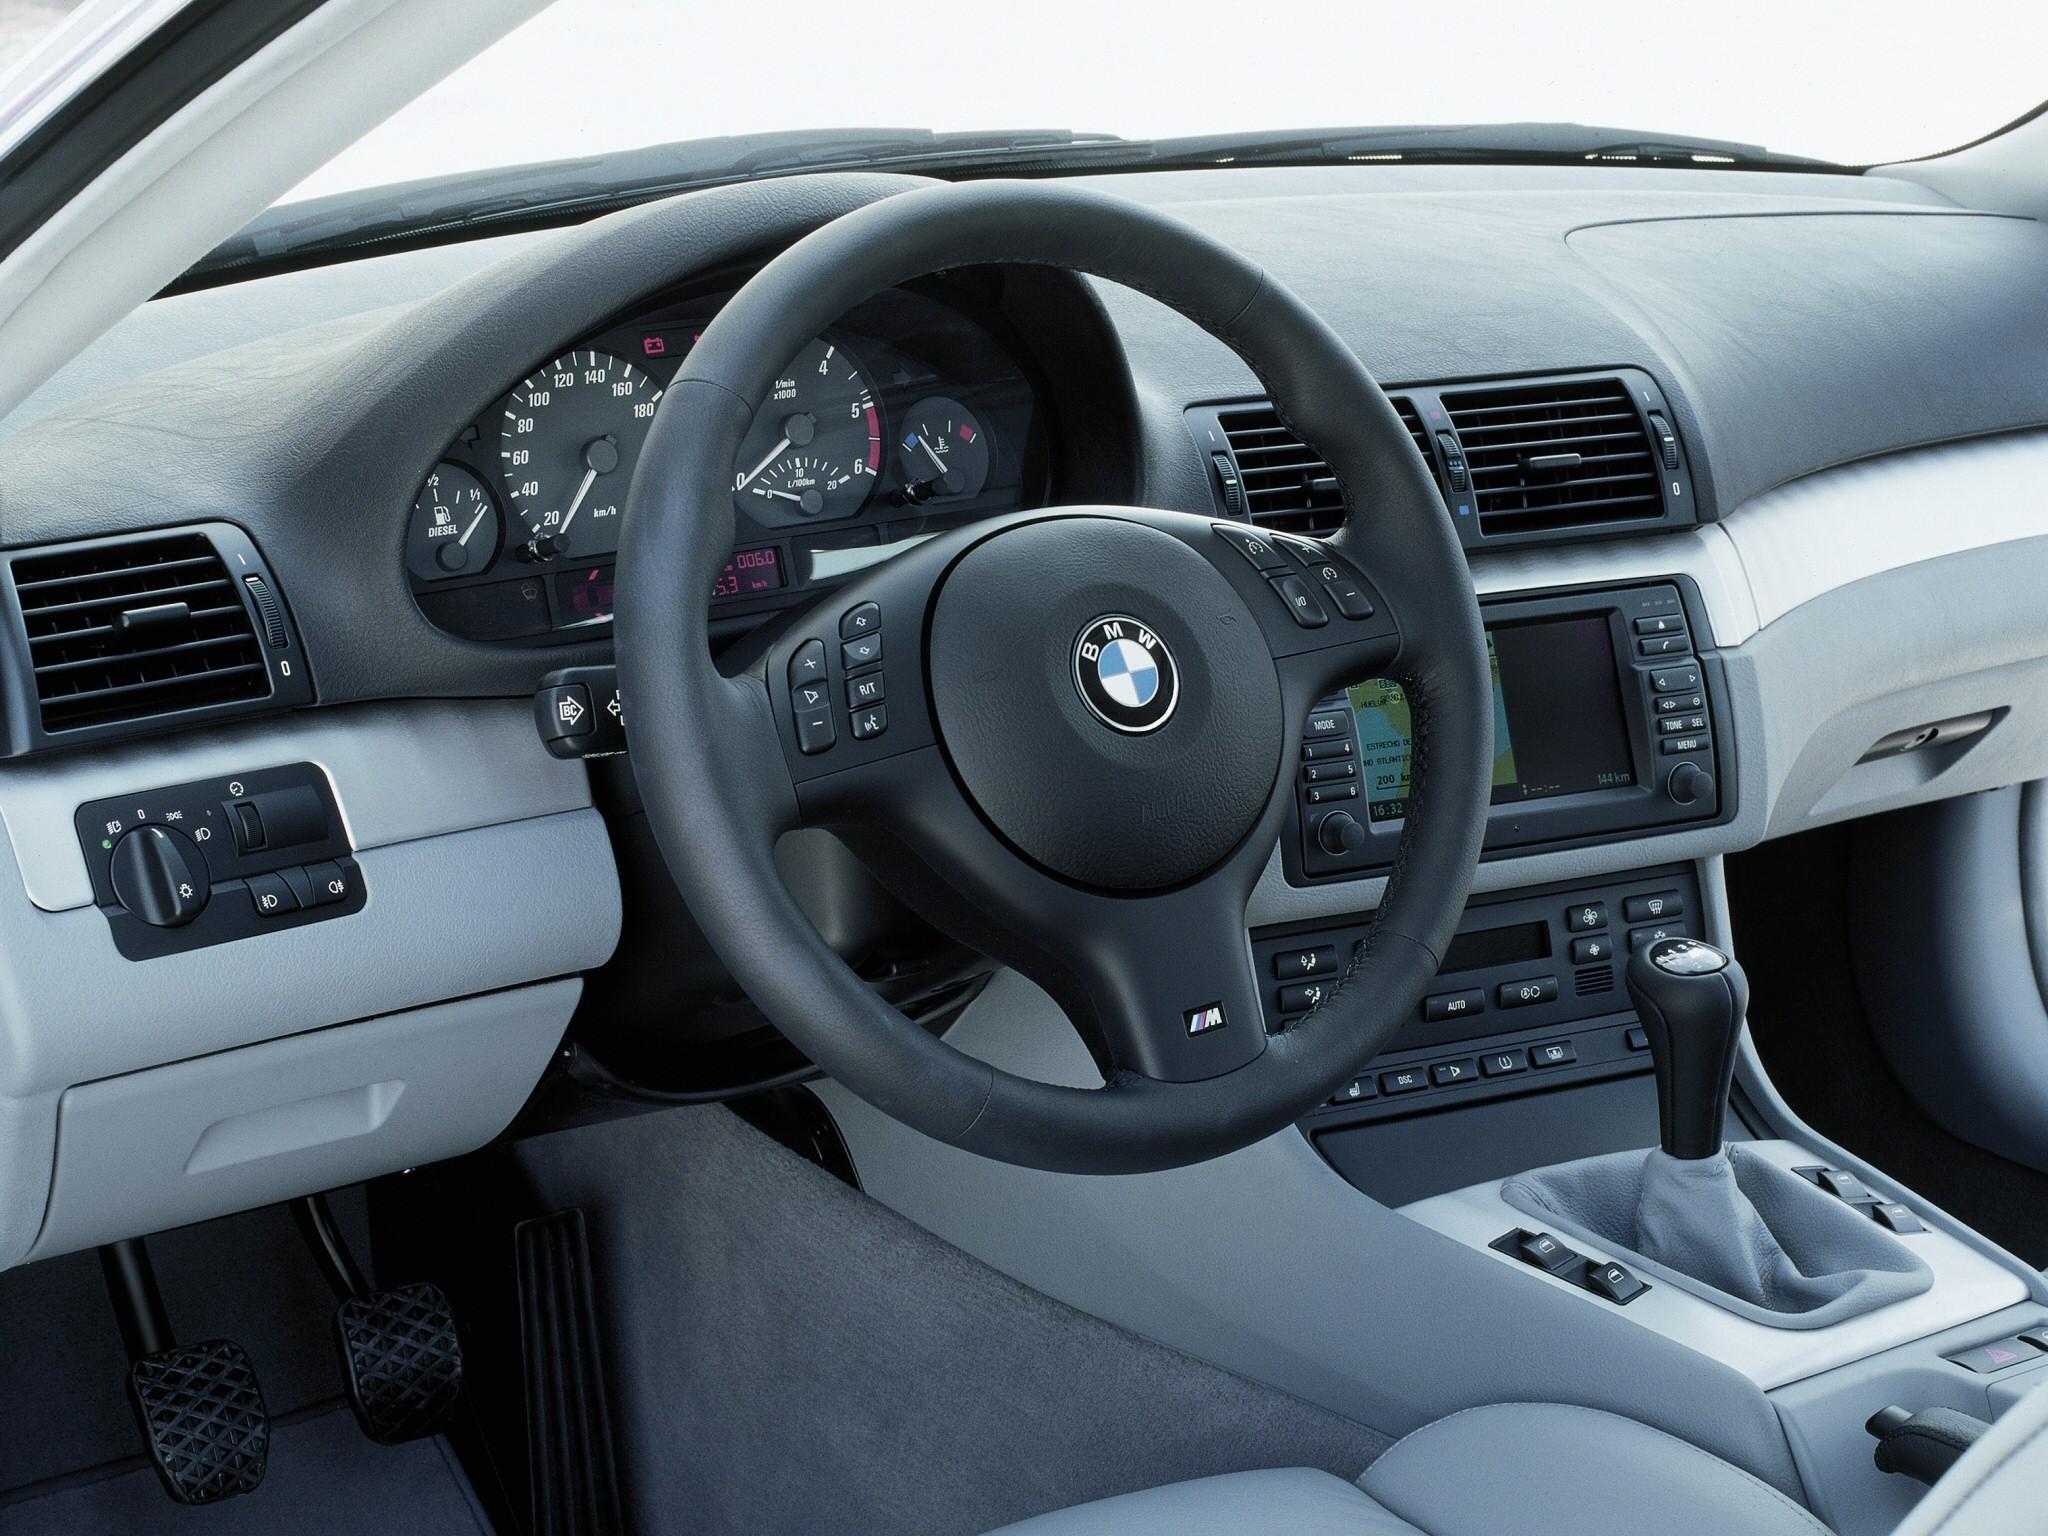 This Carplay Upgrade Makes The Bmw E46 Look Like A New Generation Car Autoevolution